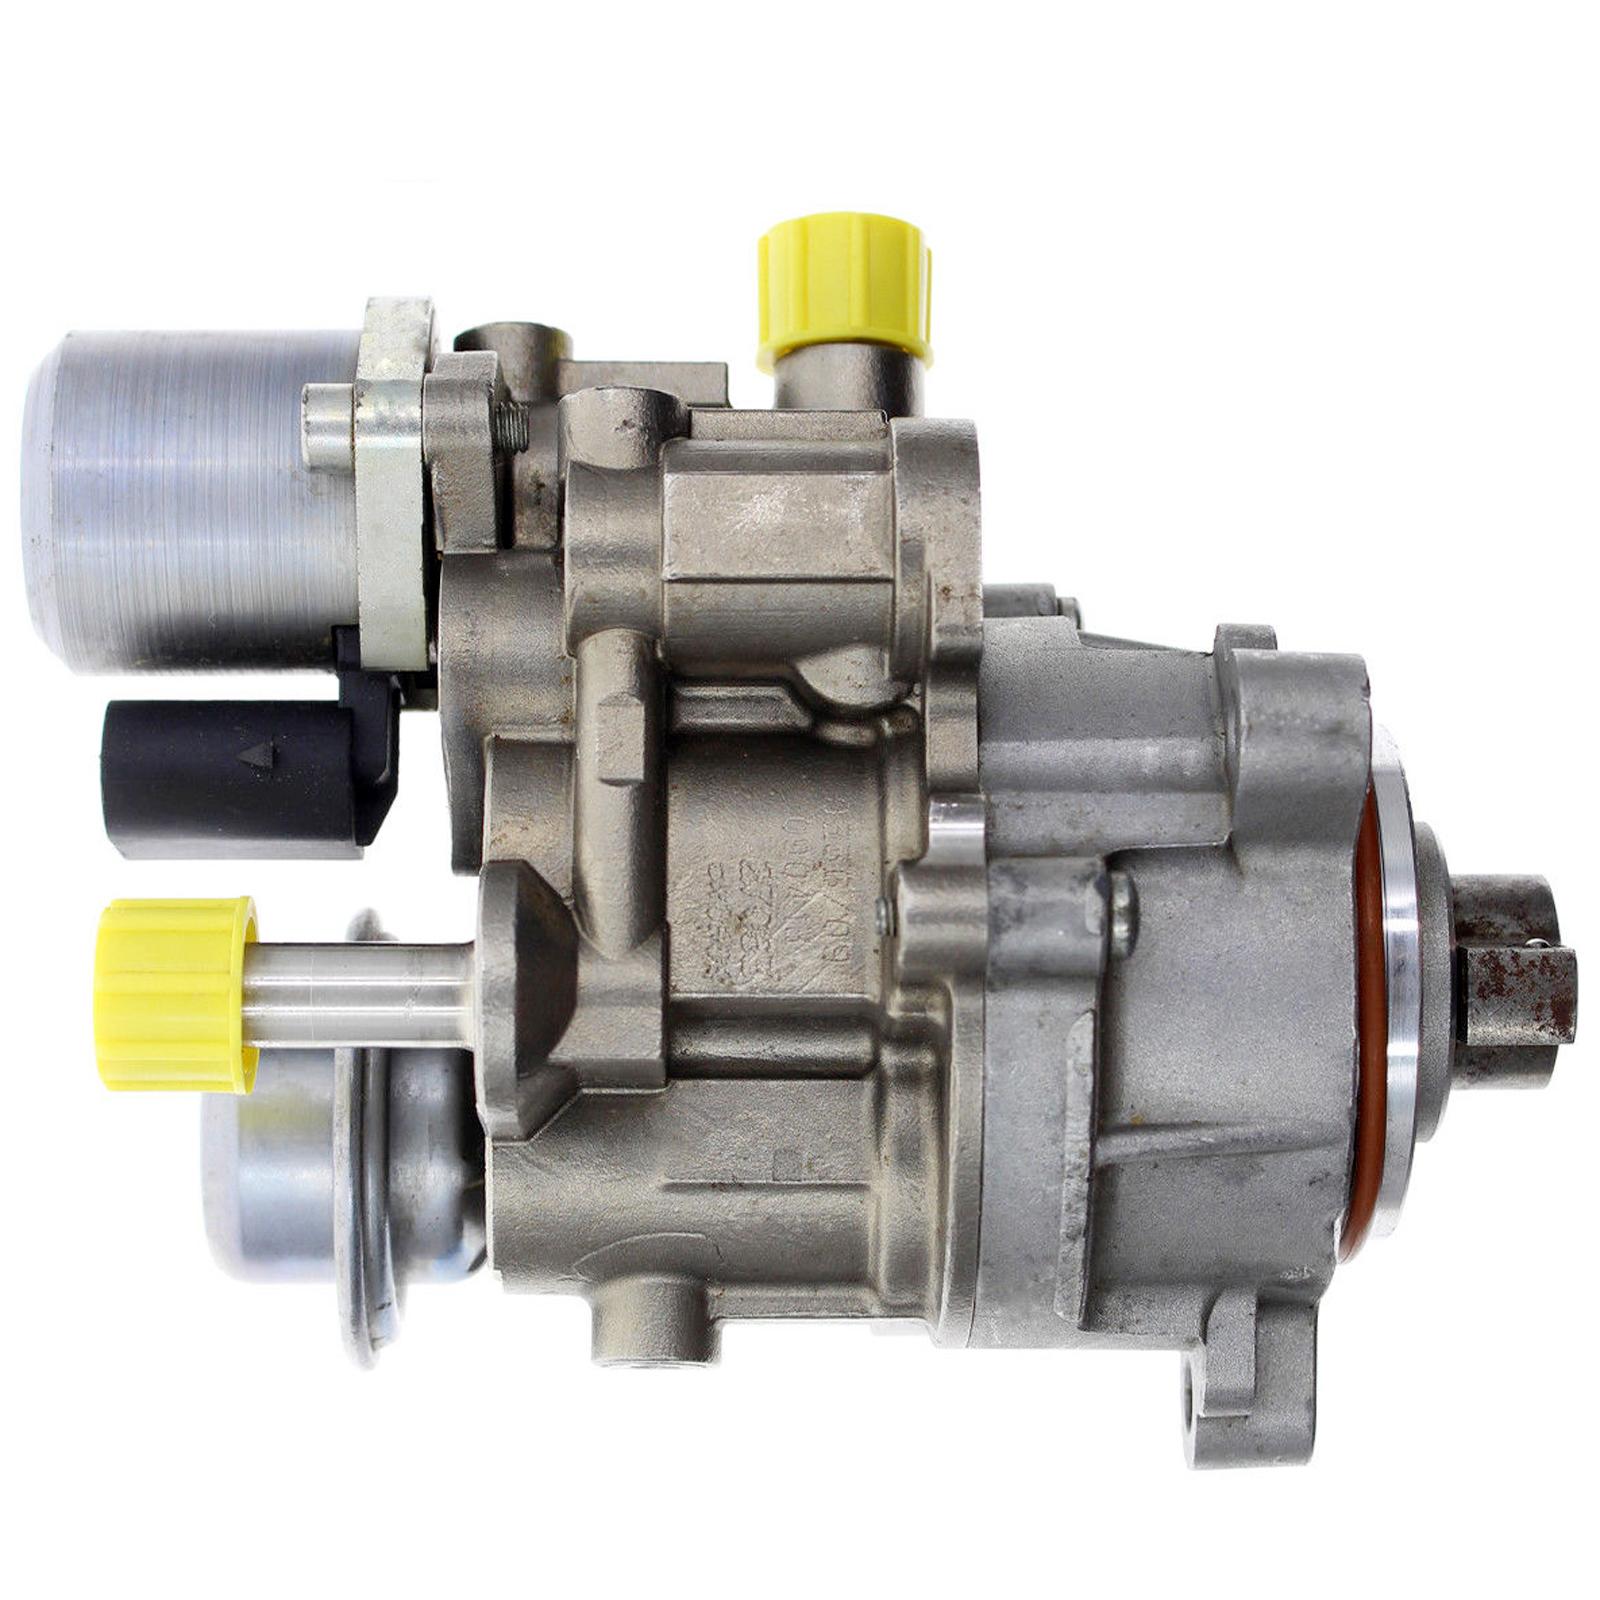 Genuine High Pressure Fuel Pump For BMW F10 640i F01 740Li F02 X1 E84 F13 740i